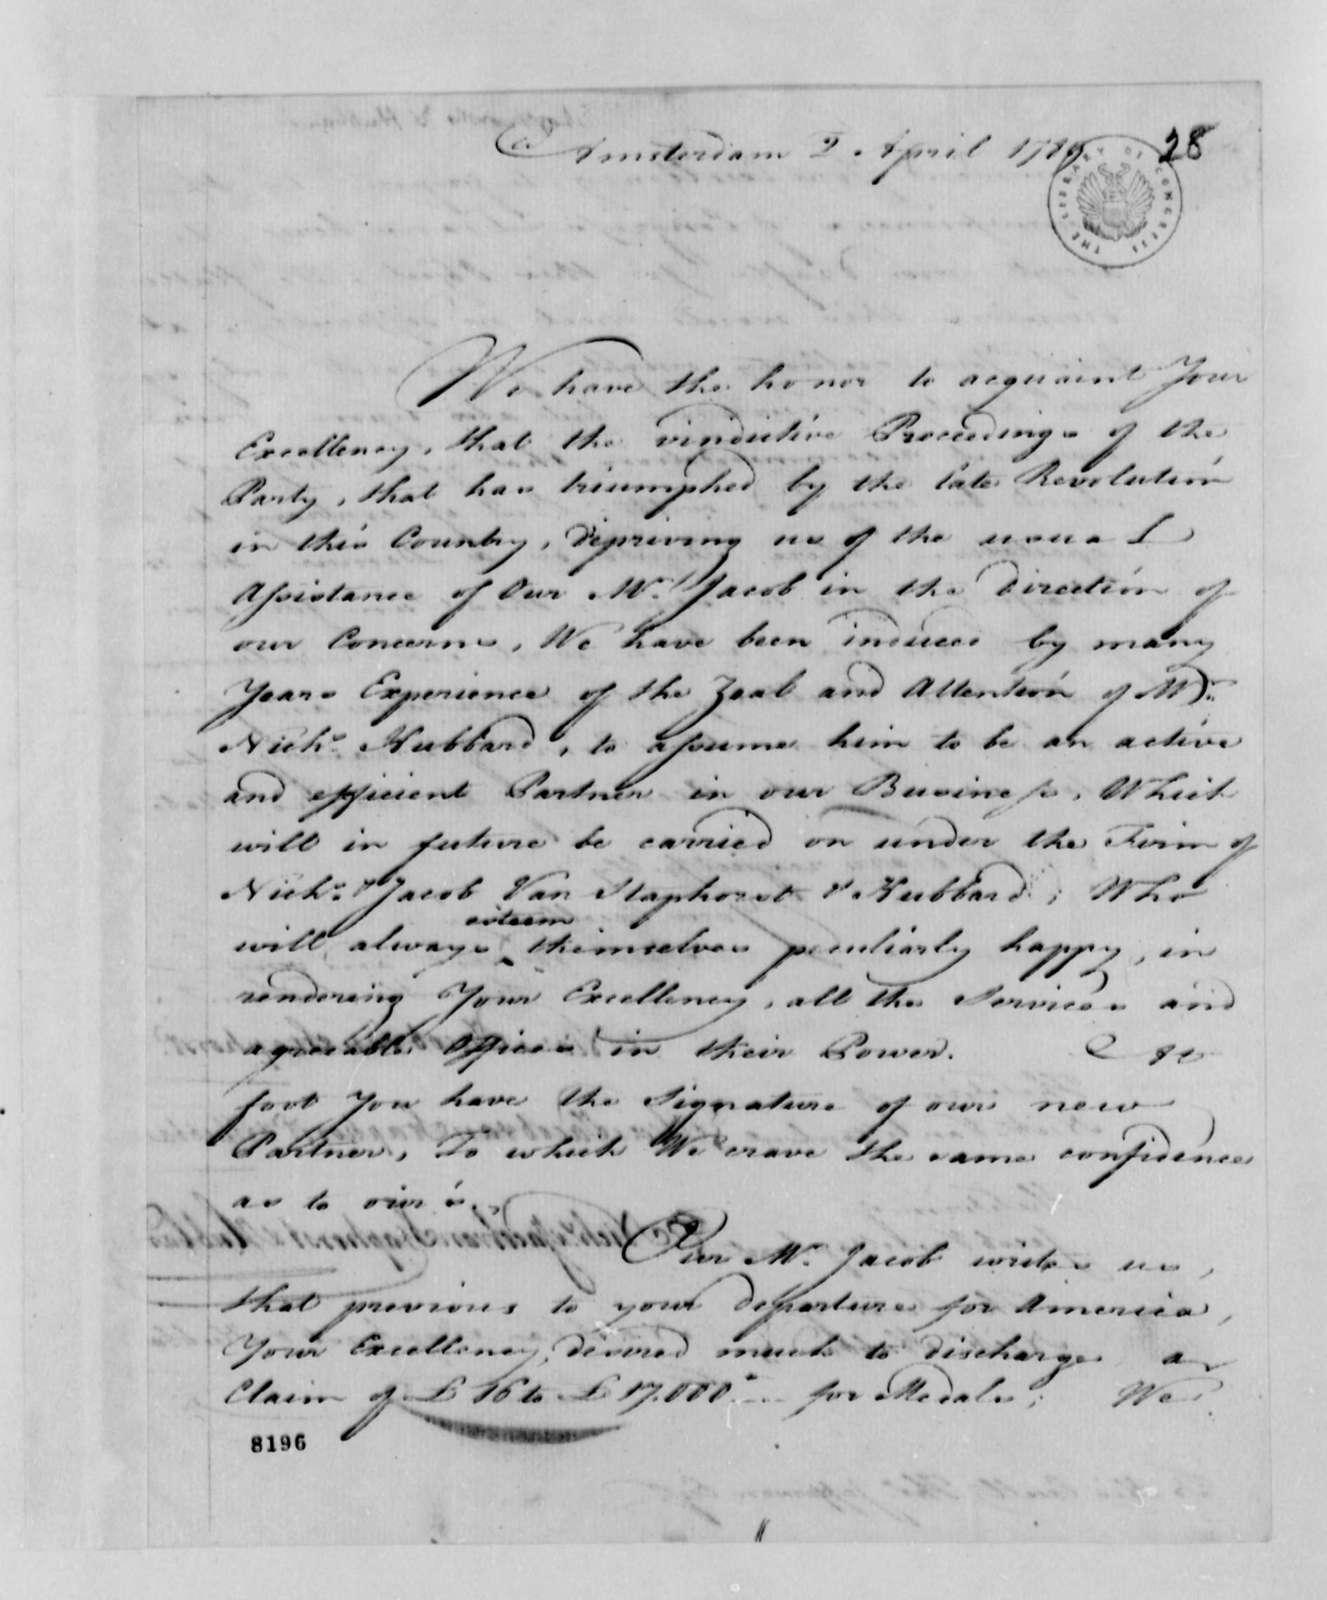 Van Staphorst & Hubbard to Thomas Jefferson, April 2, 1789